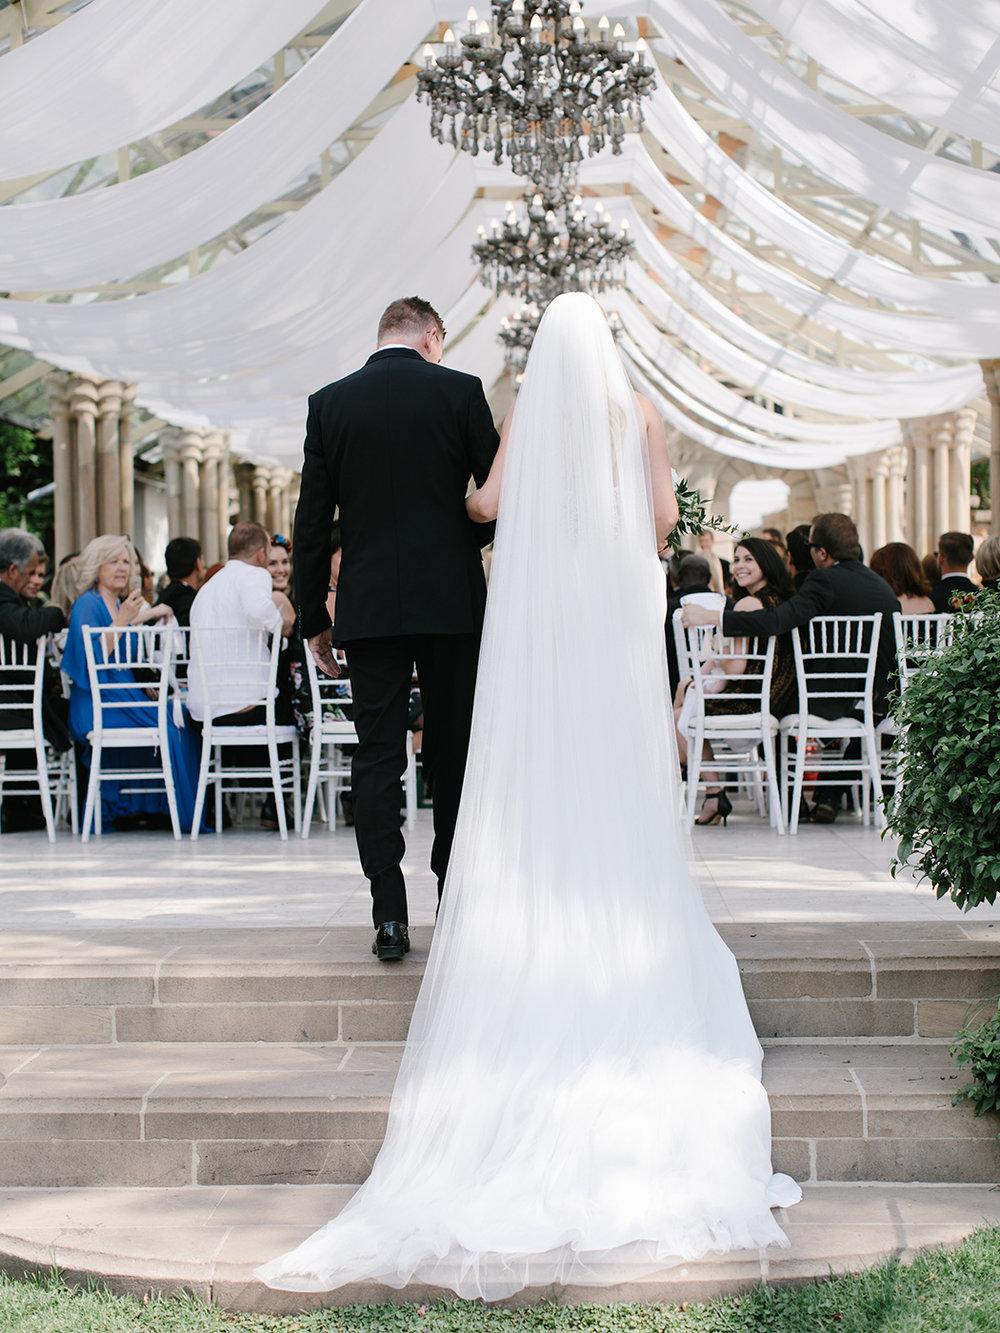 Here comes the Bride | Rensche Mari Photography